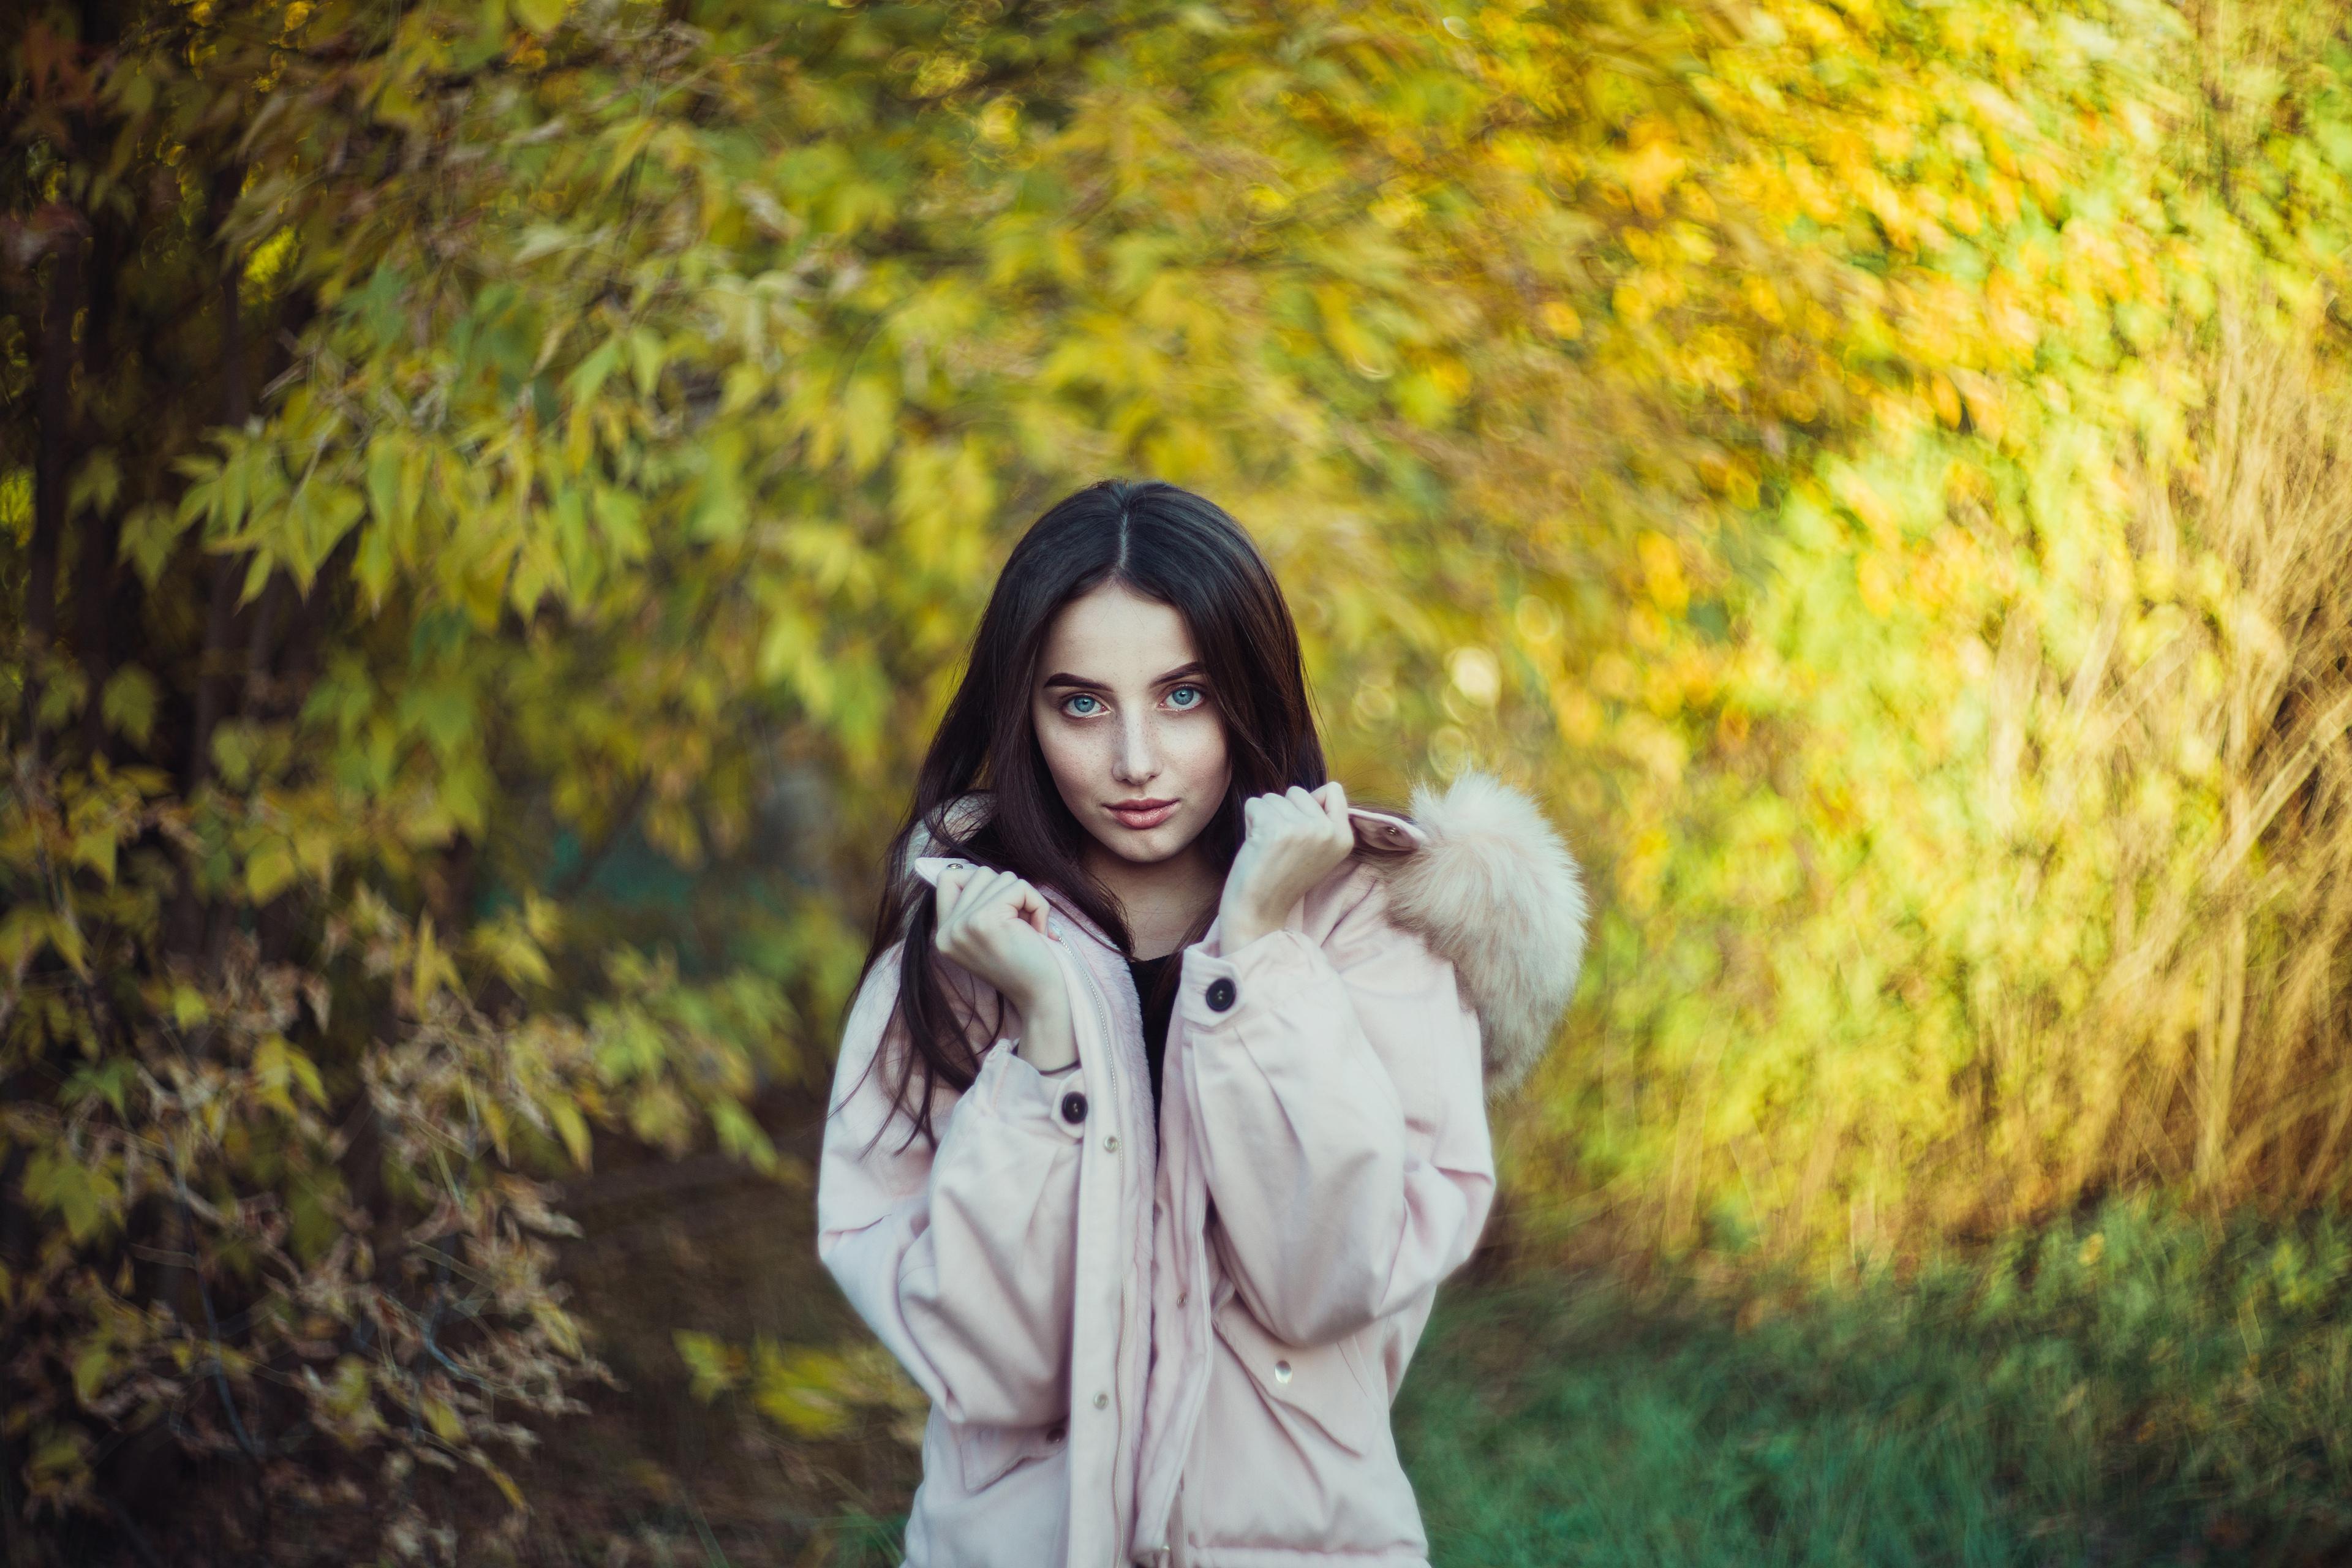 blue eyes girl winter clothing 1575665890 - Blue Eyes Girl Winter Clothing -